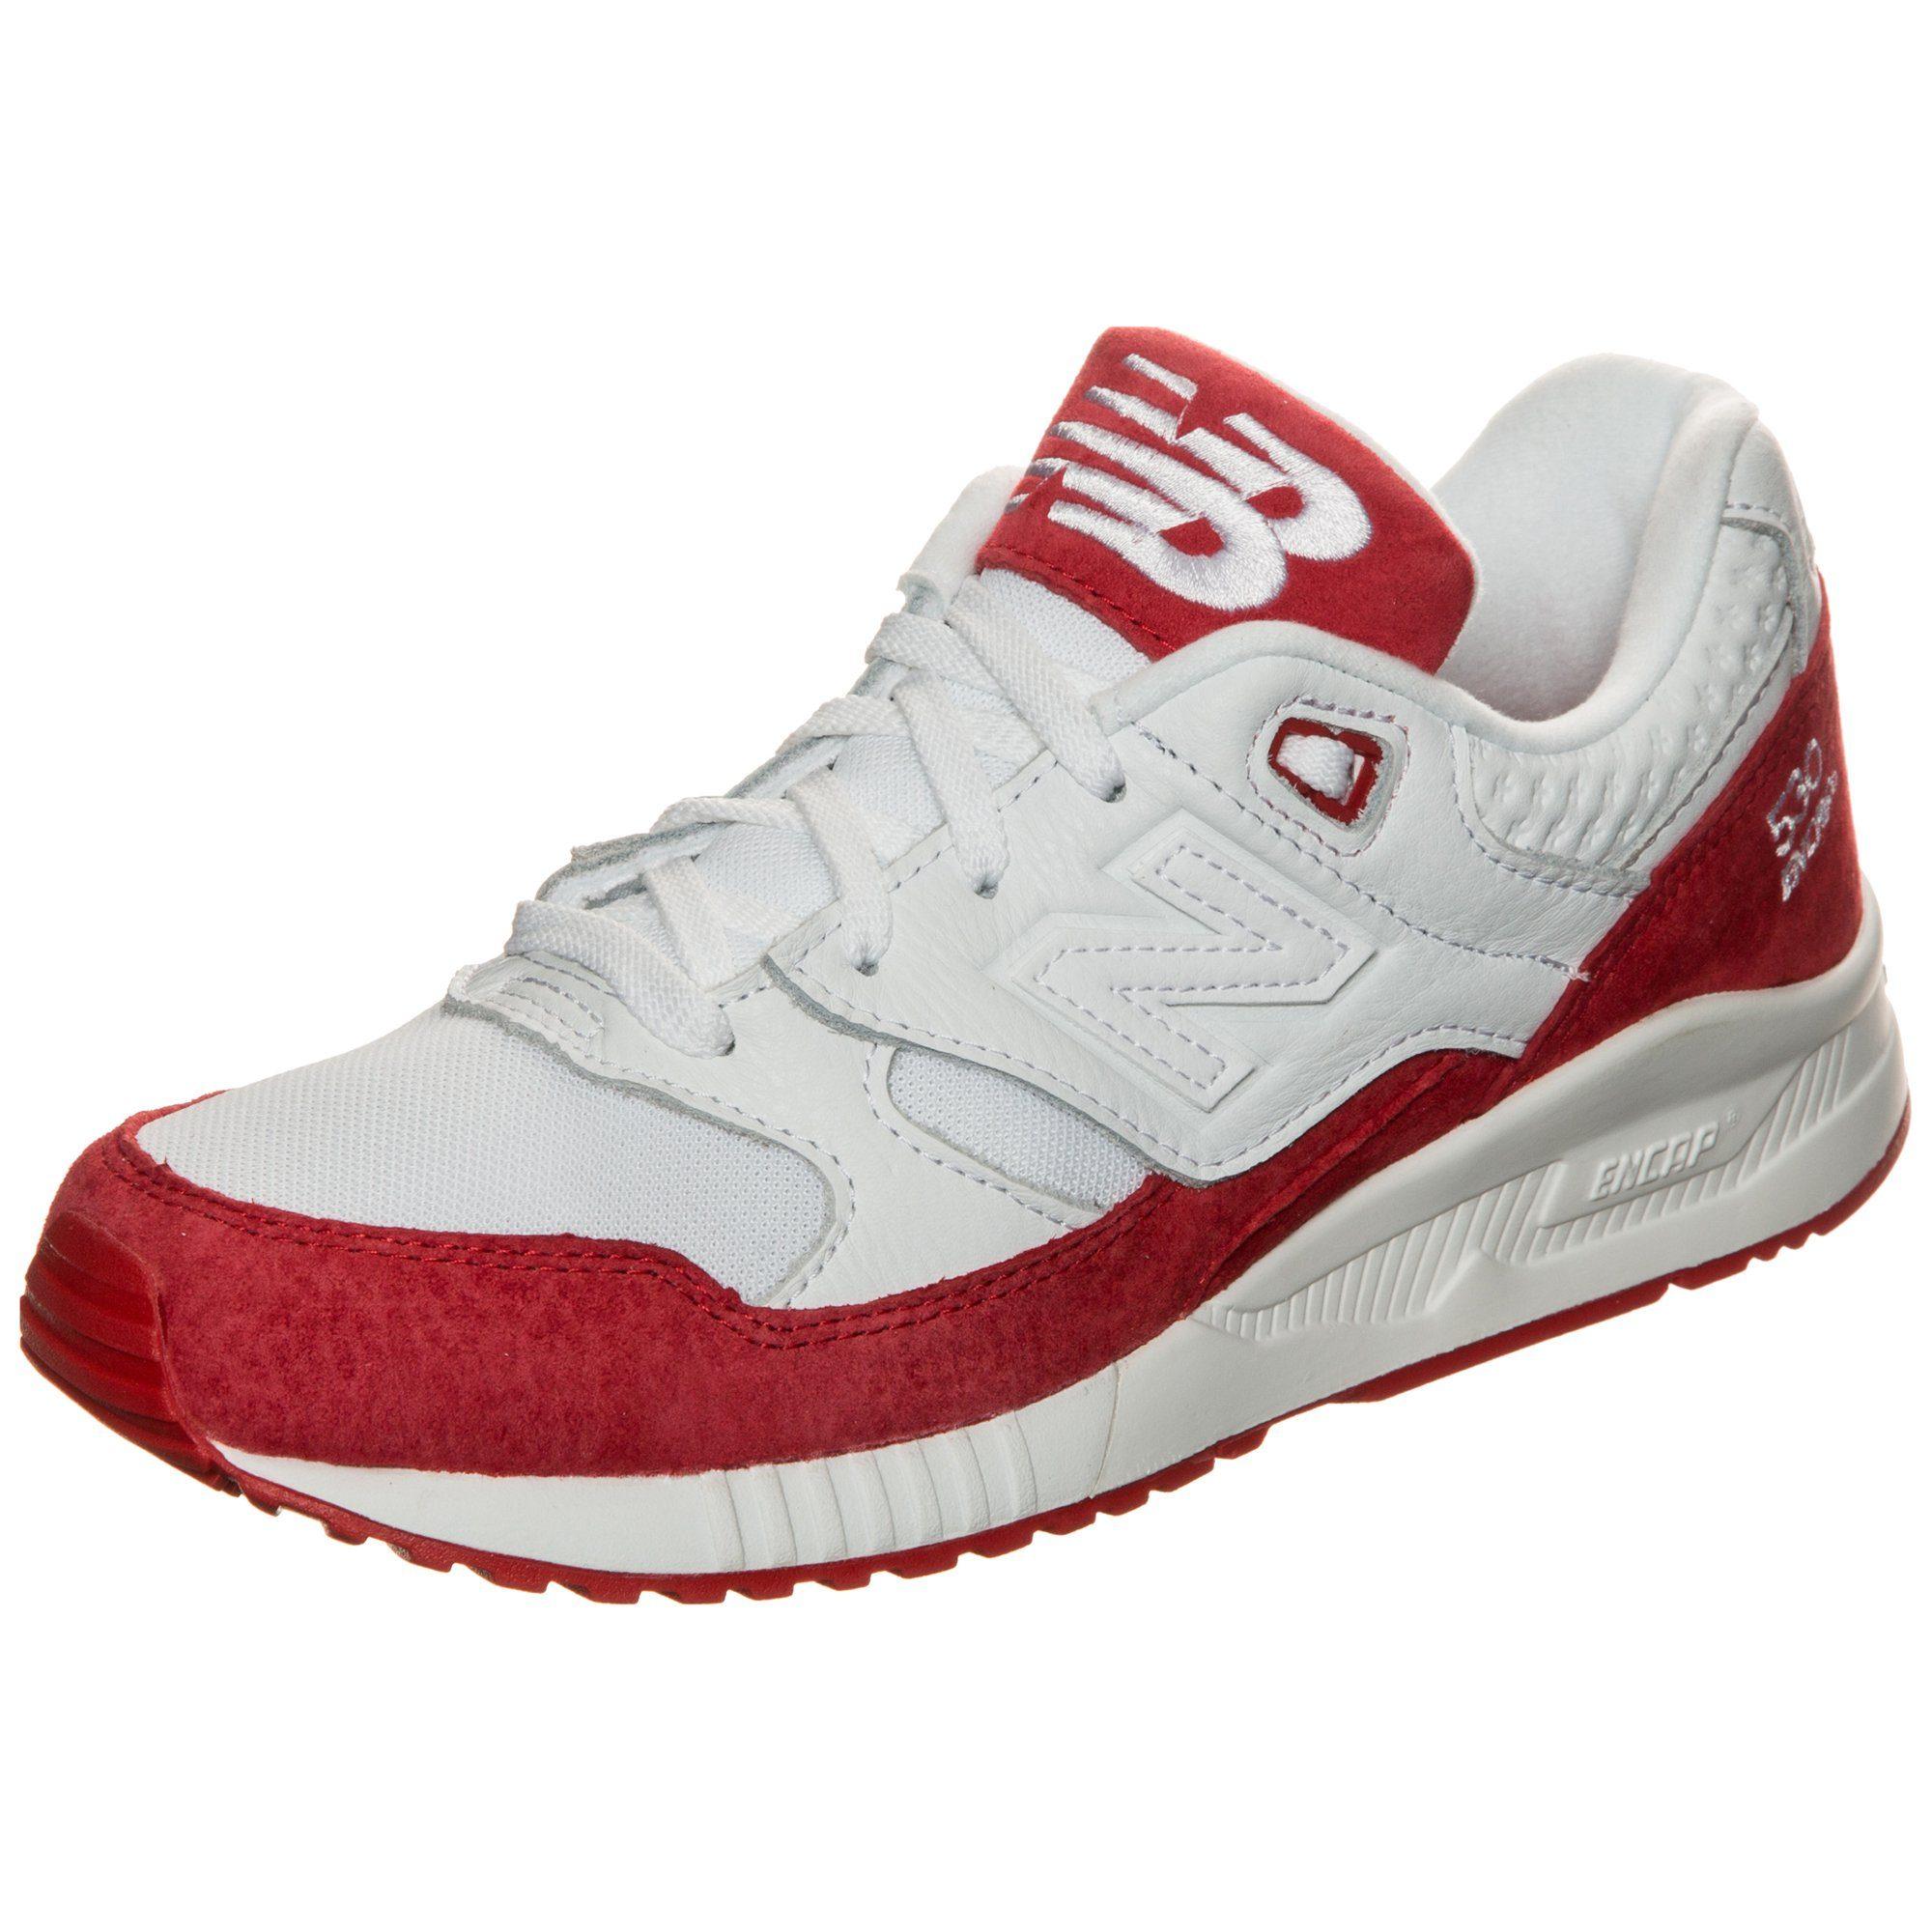 New Balance W530-ecc-b Sneaker online kaufen  weiß-rot